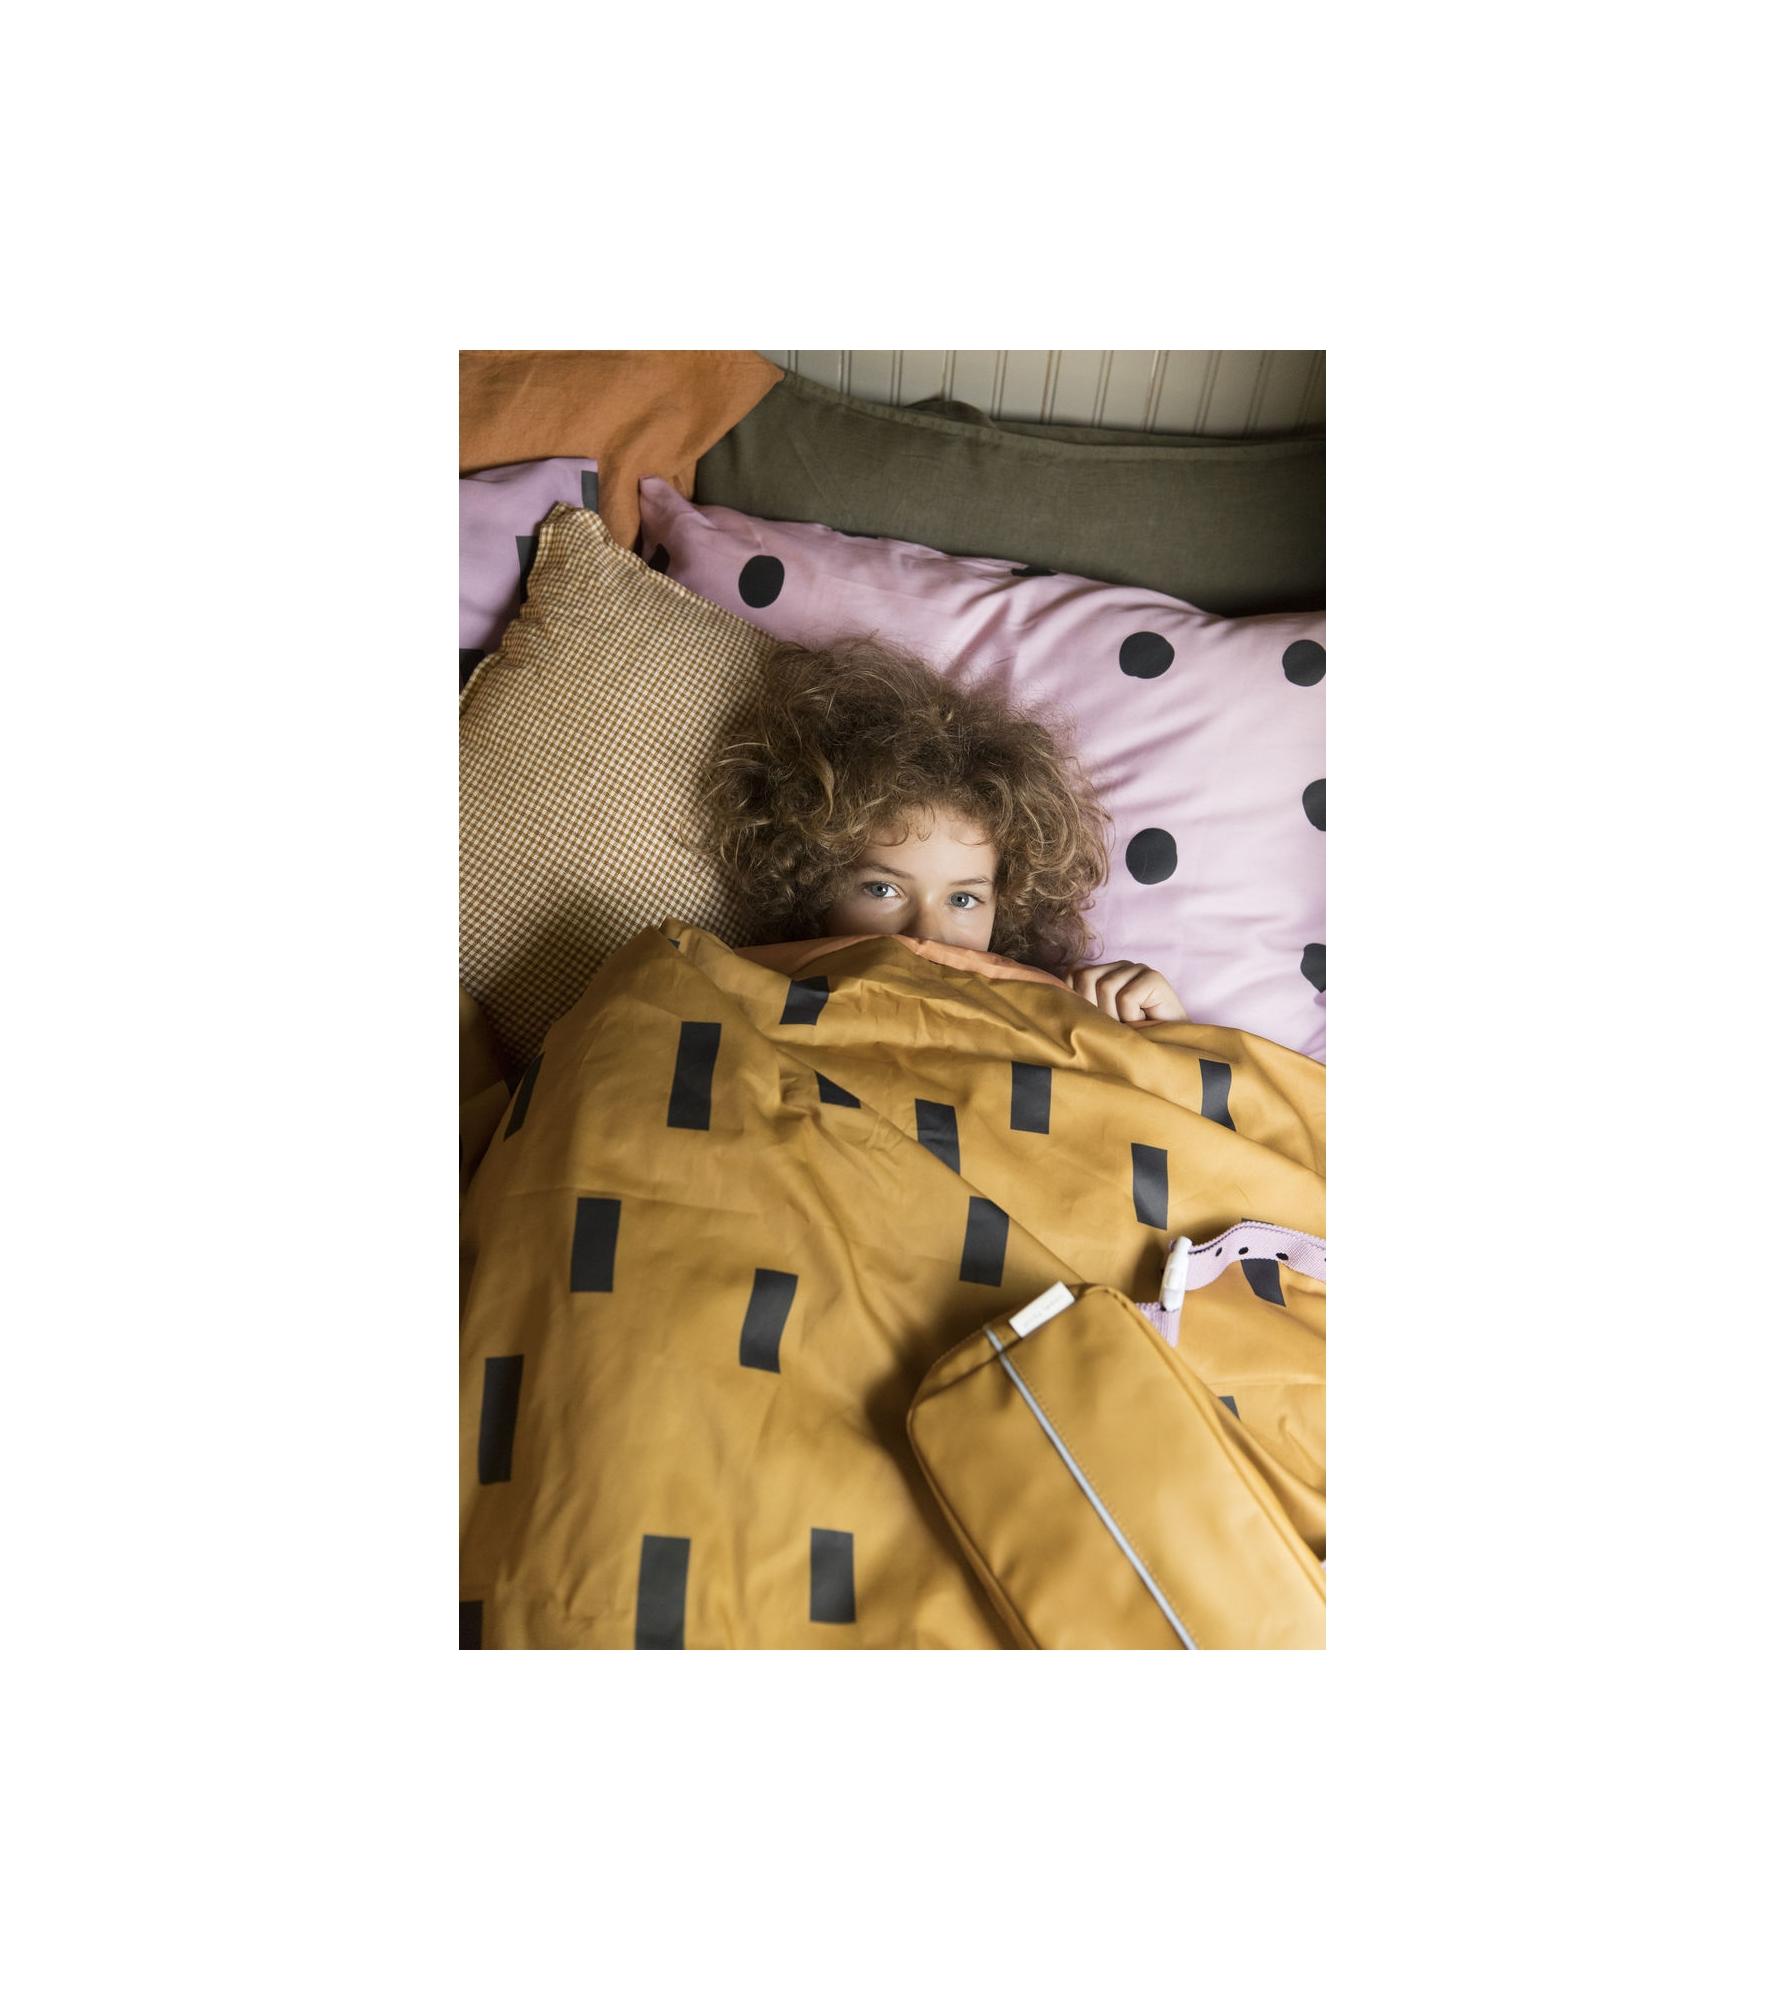 1801651 - Sticky Lemon - fanny pack large - freckles - caramel fudge + pirate purple - style sho.jpg